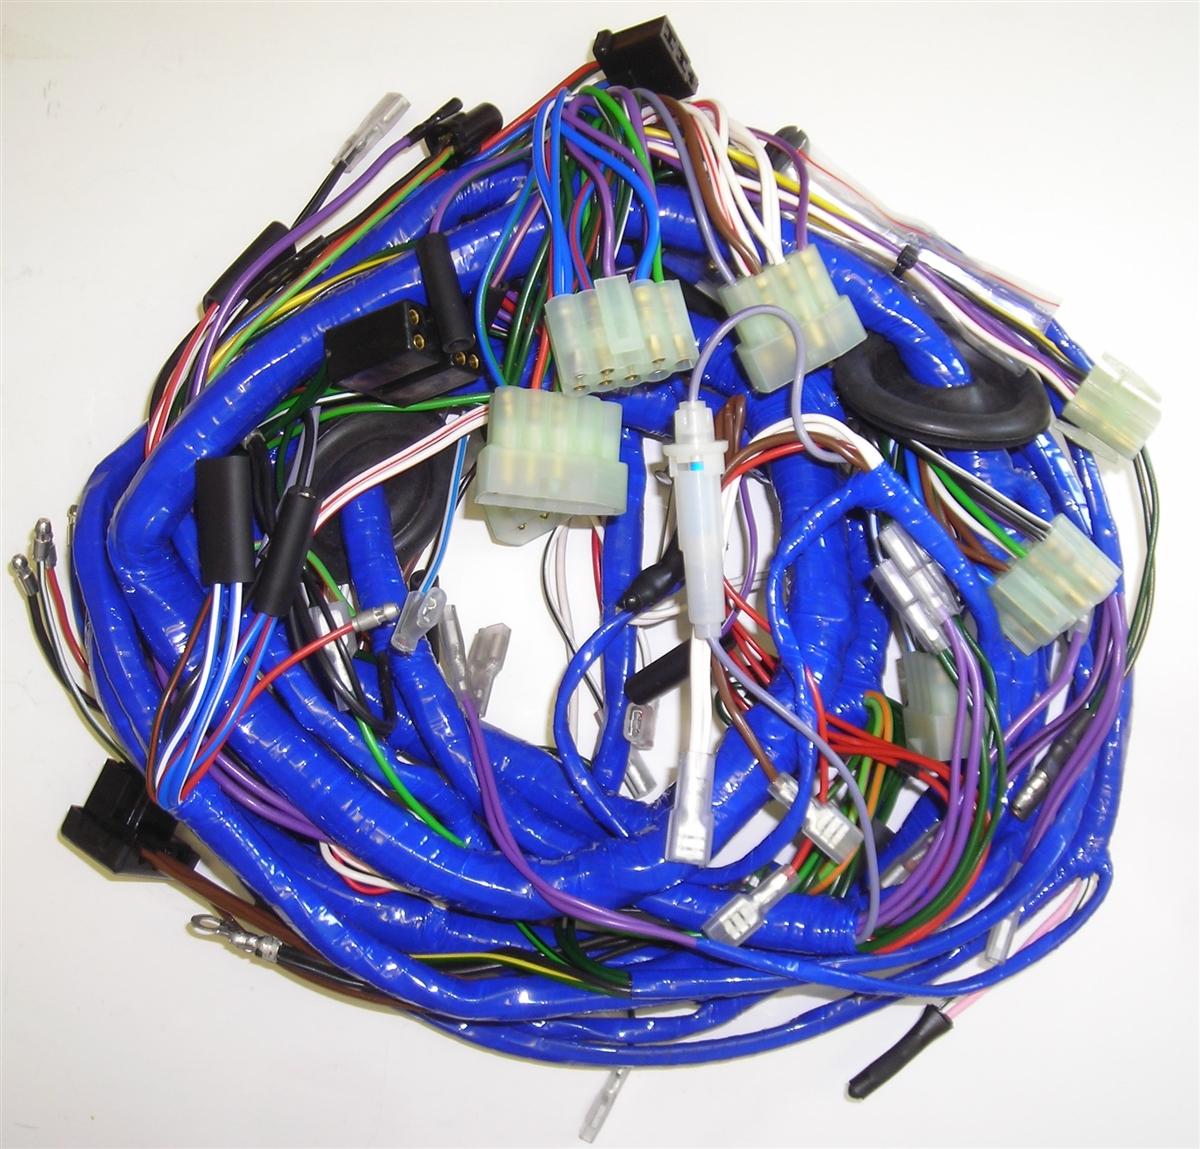 main wiring harness mg midget rh britishwiring com 1972 mg midget wiring harness